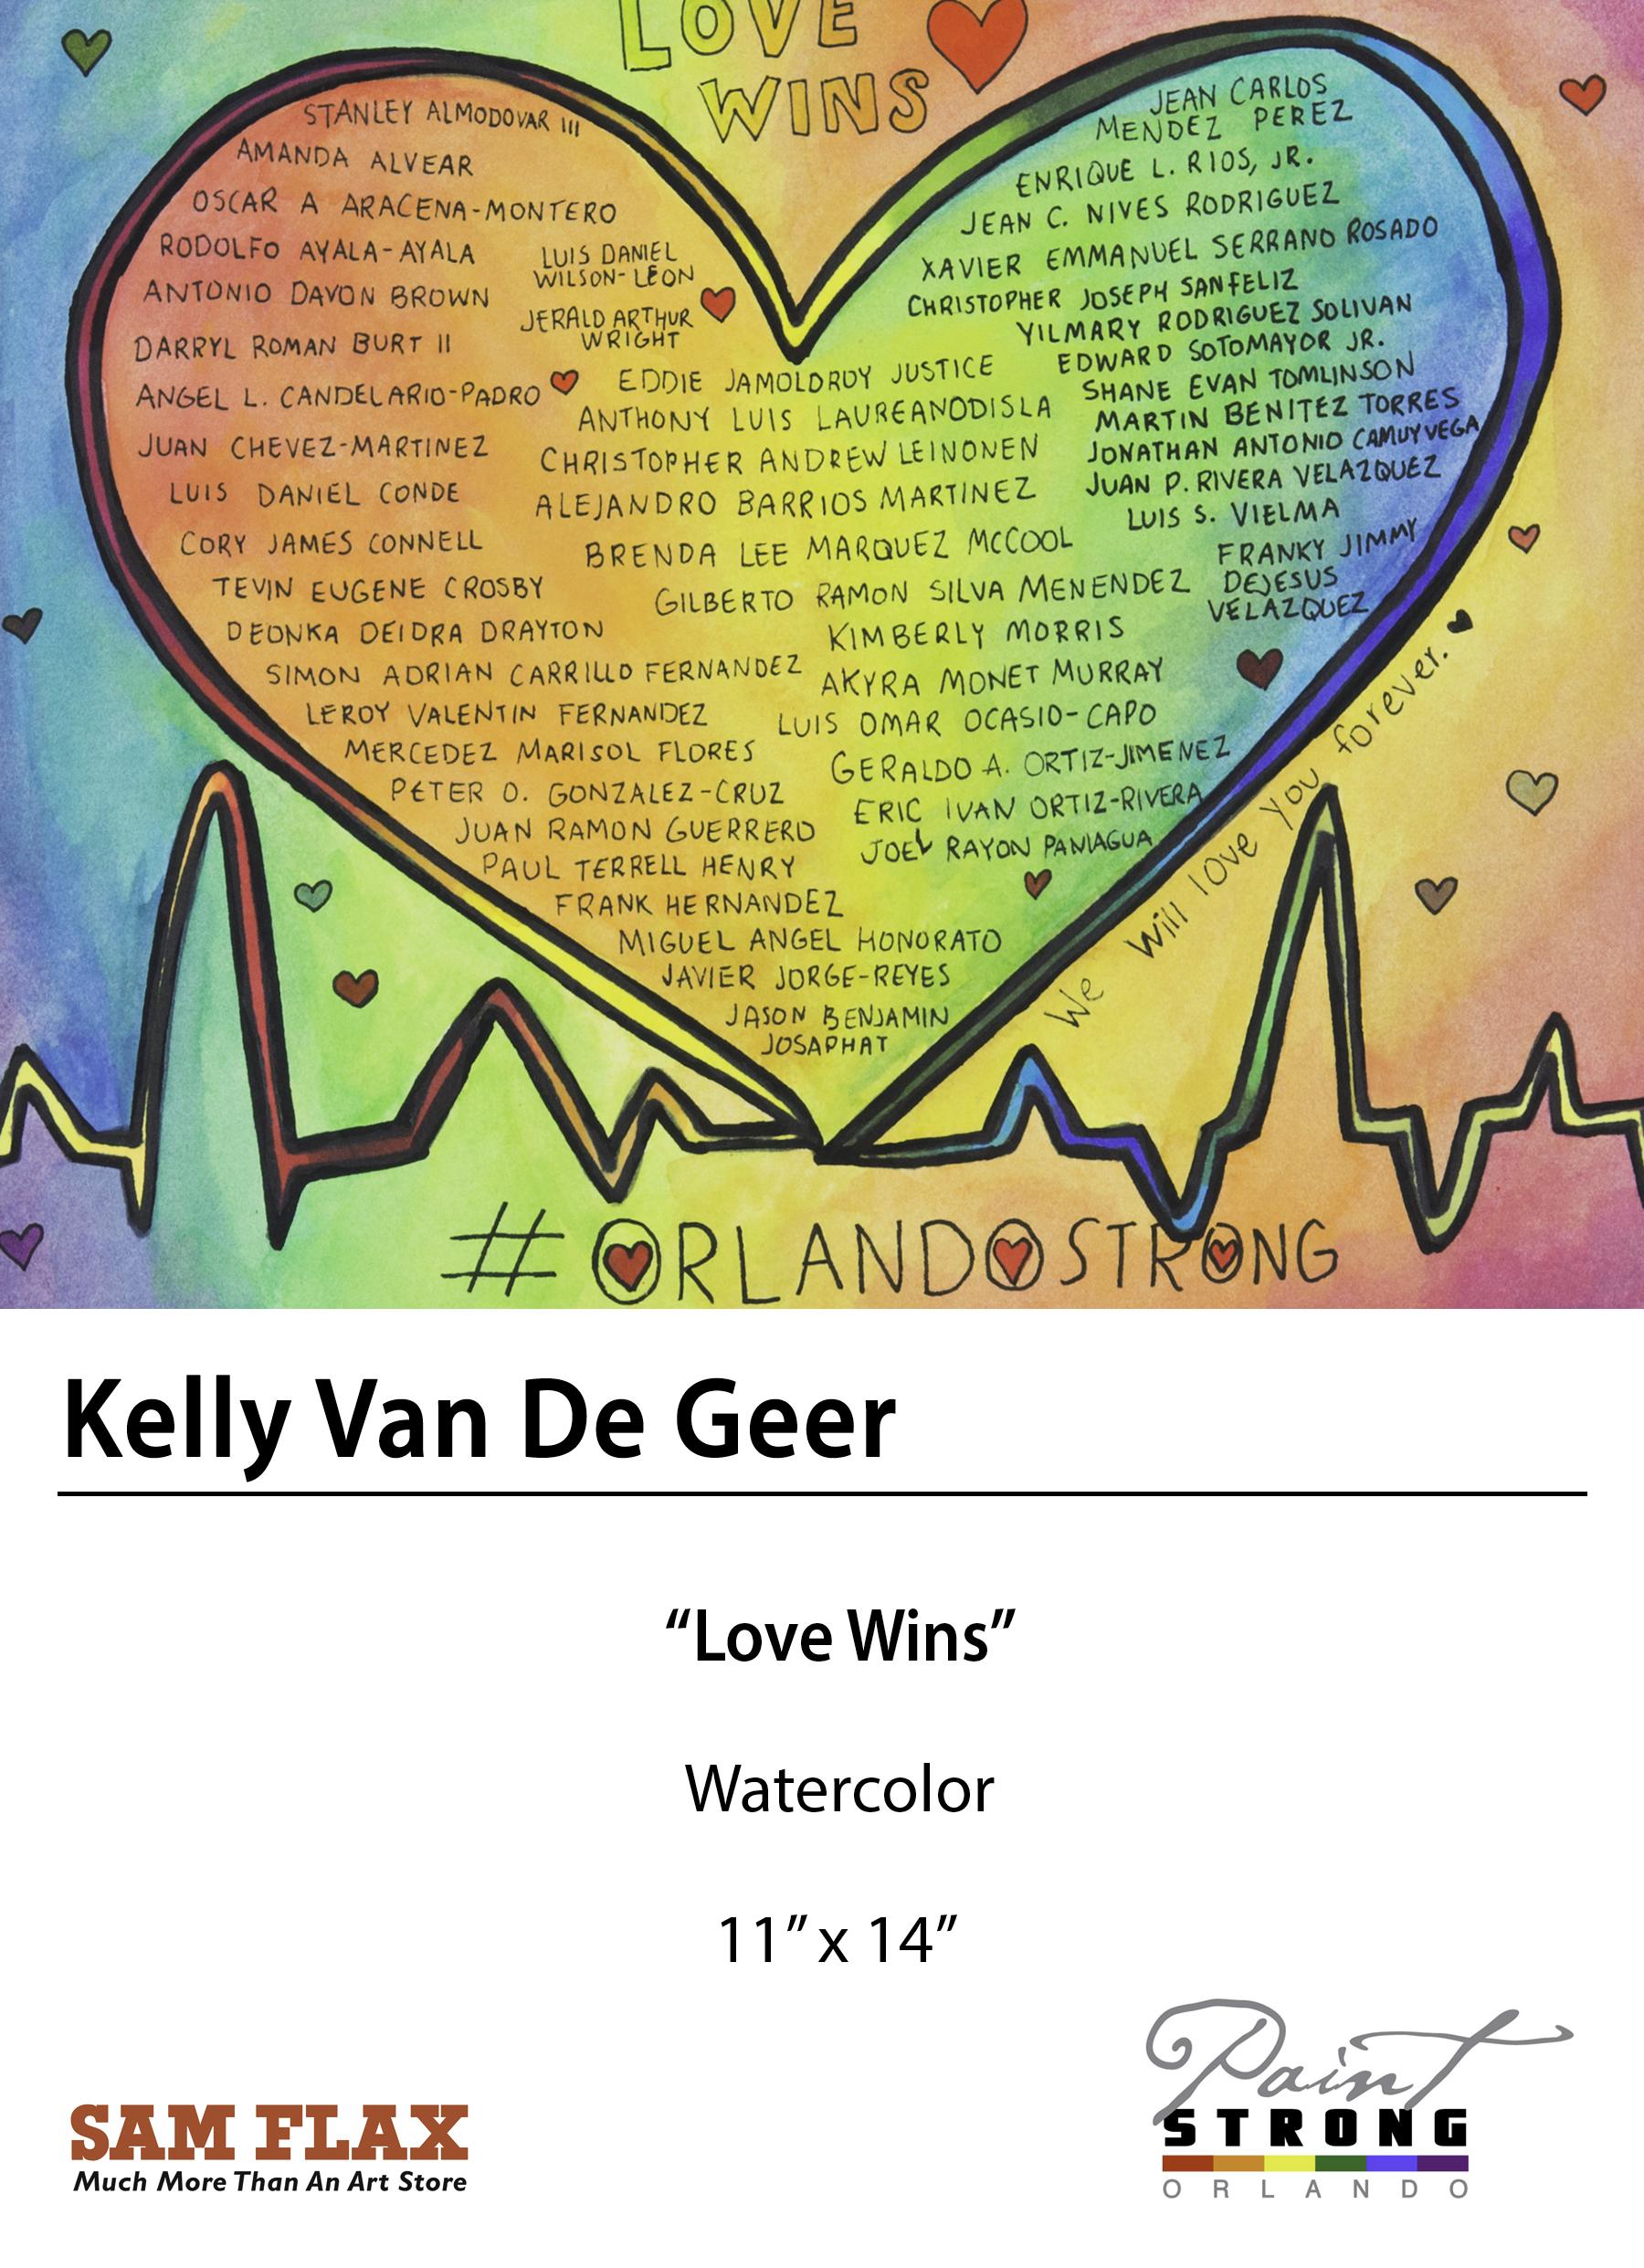 Kelly Van De Geer